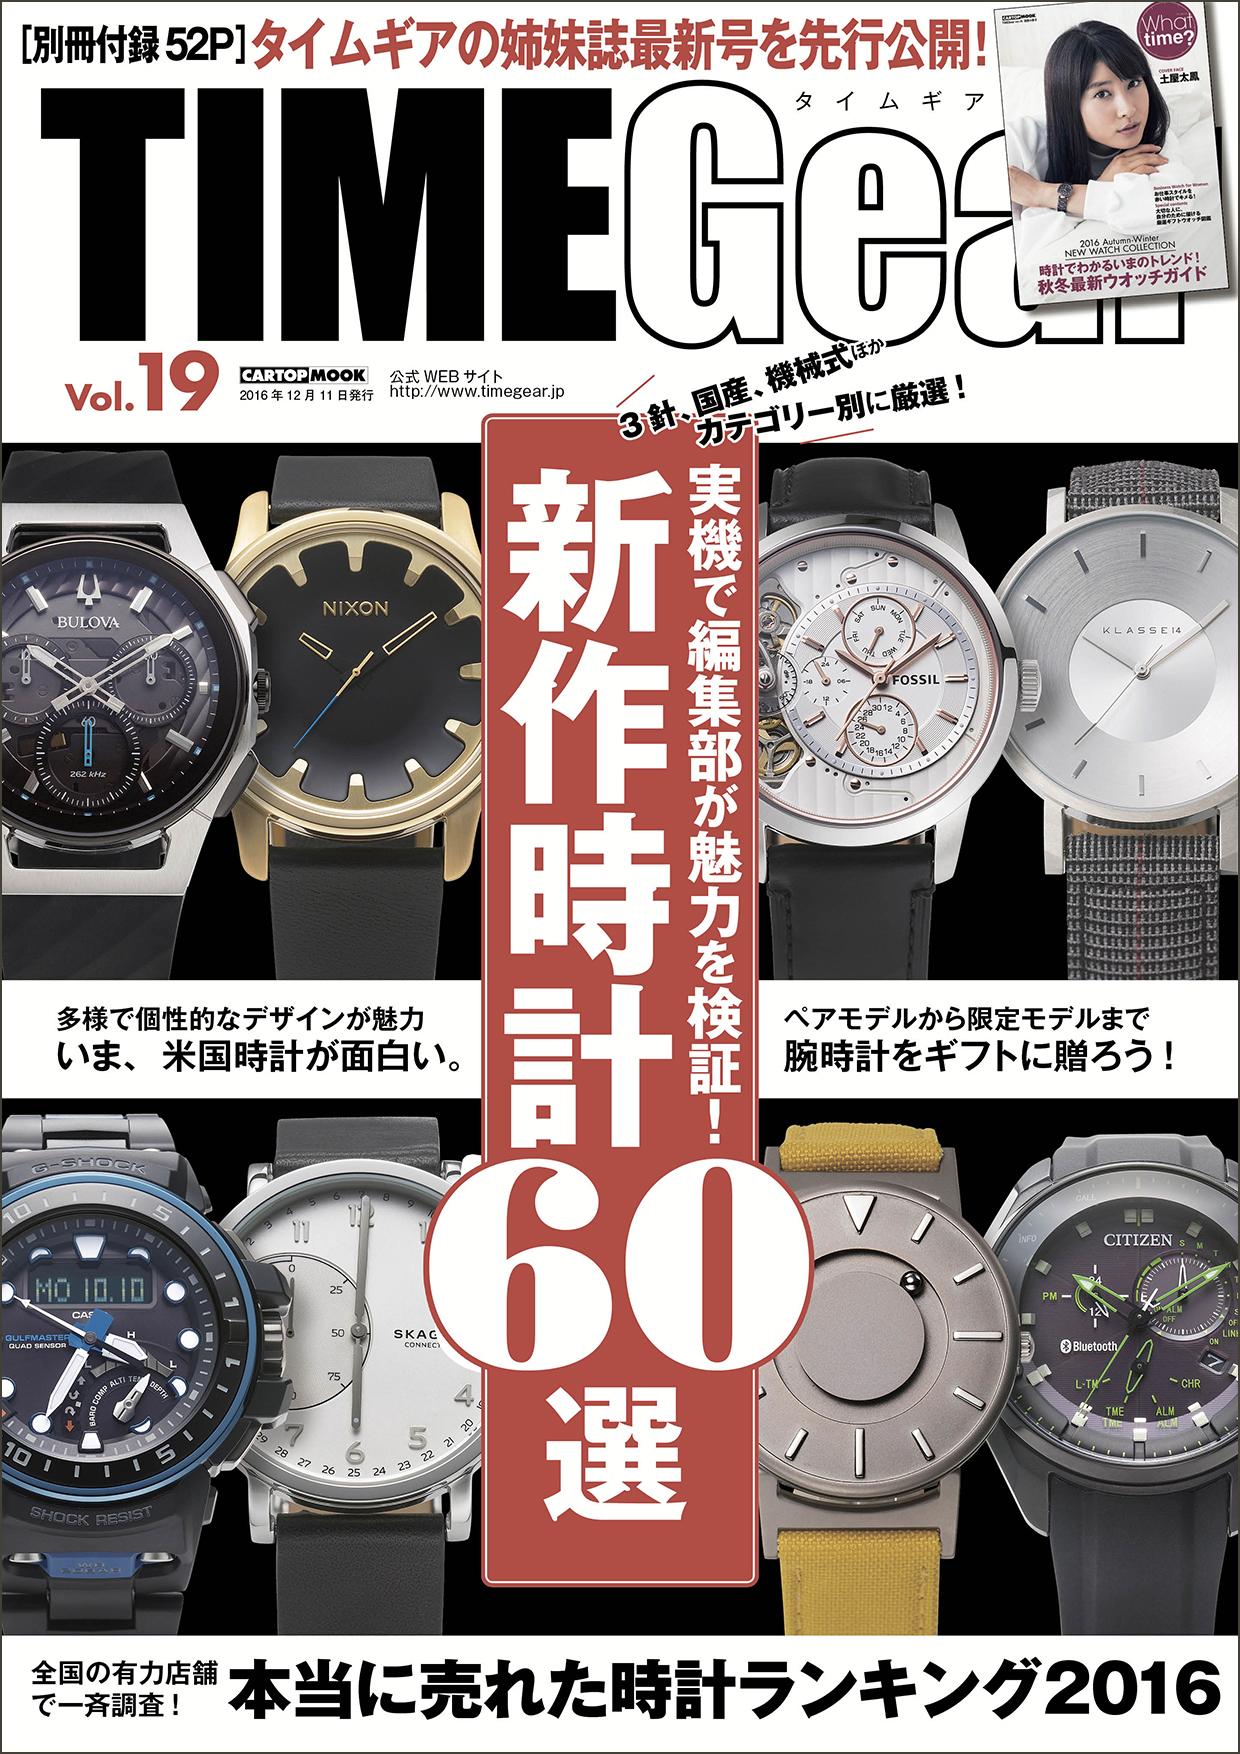 C's-Factory|書籍|TIME Gear Vol.18